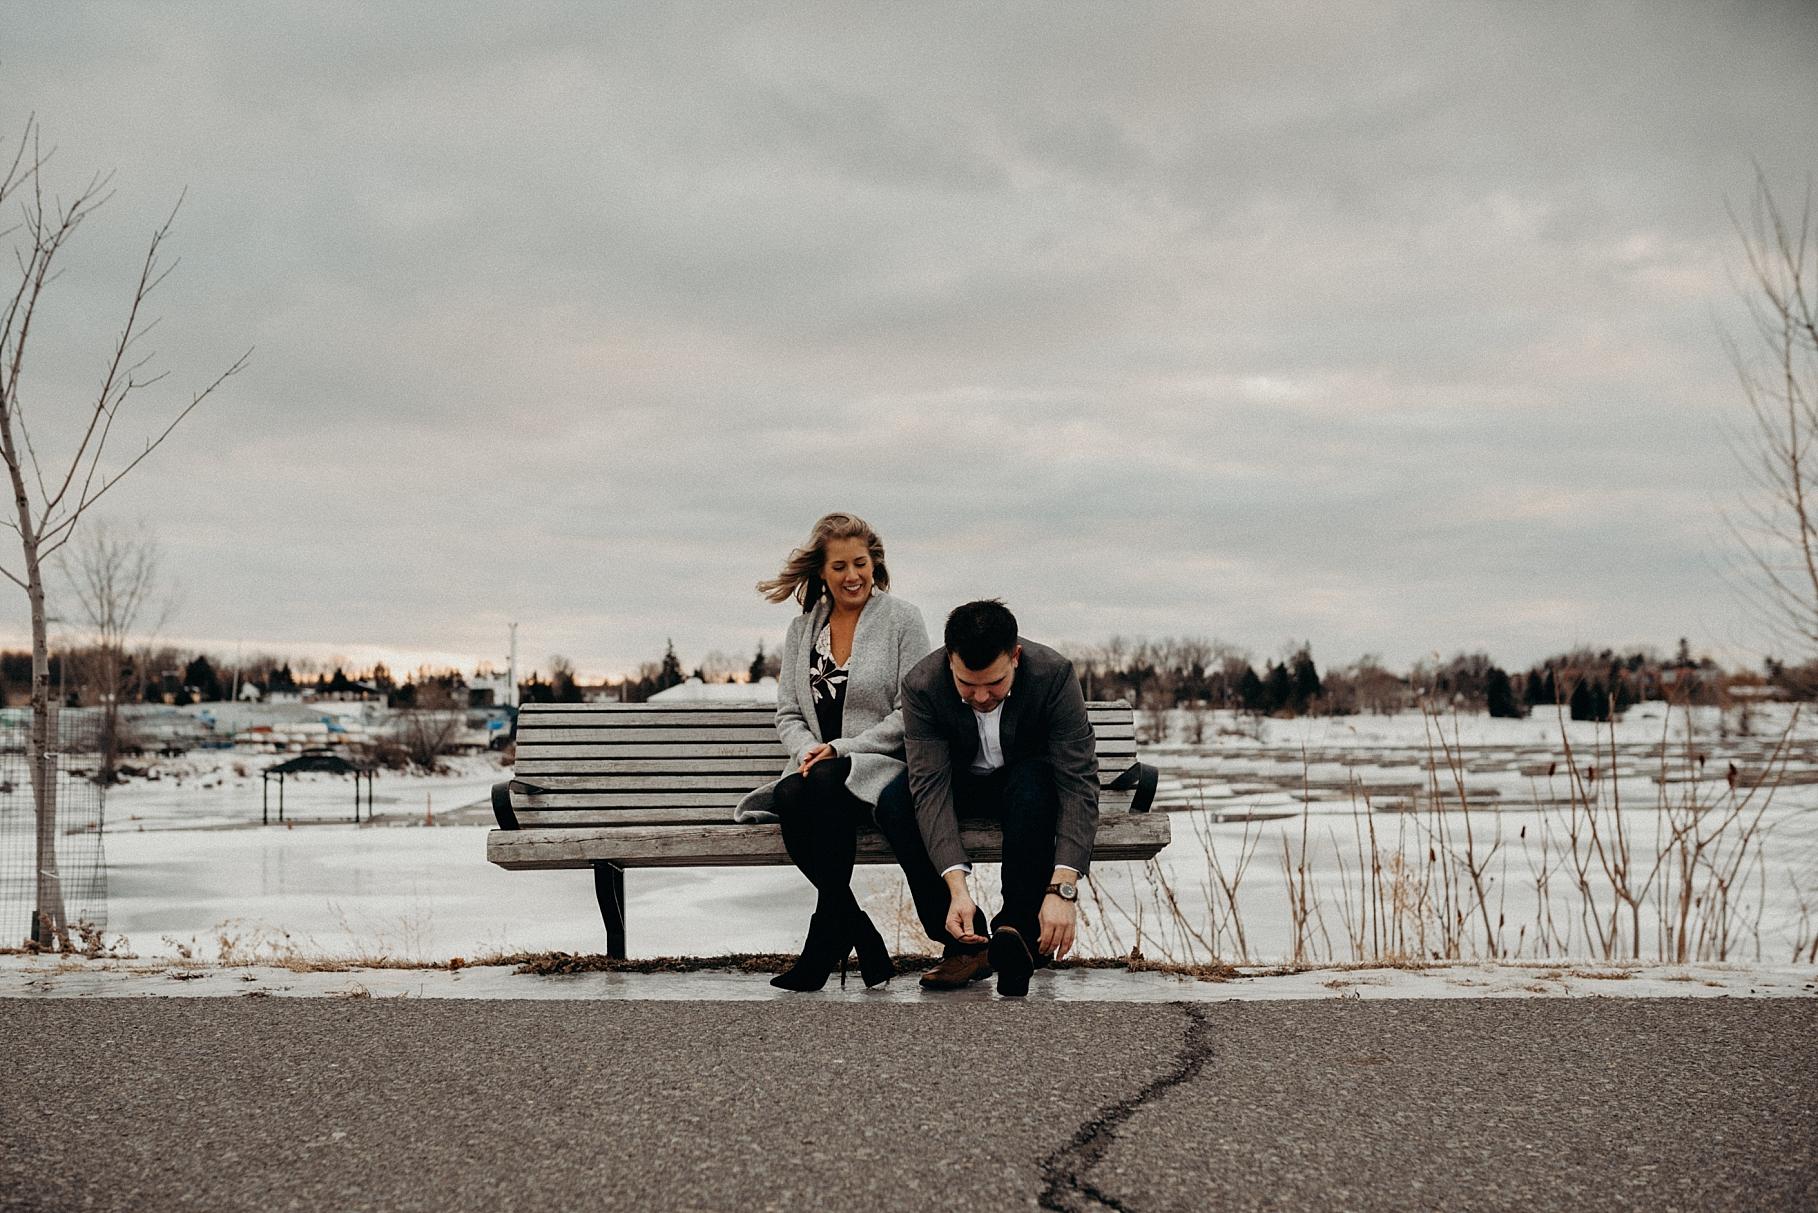 Mocha Tree Studios Ottawa Toronto Montreal Wedding and Engagement Photographer and Videographer Dark Moody Intimate Authentic Modern Romantic Cinematic Best Candid Nepean Sailing Club Andew Haydon Park 4